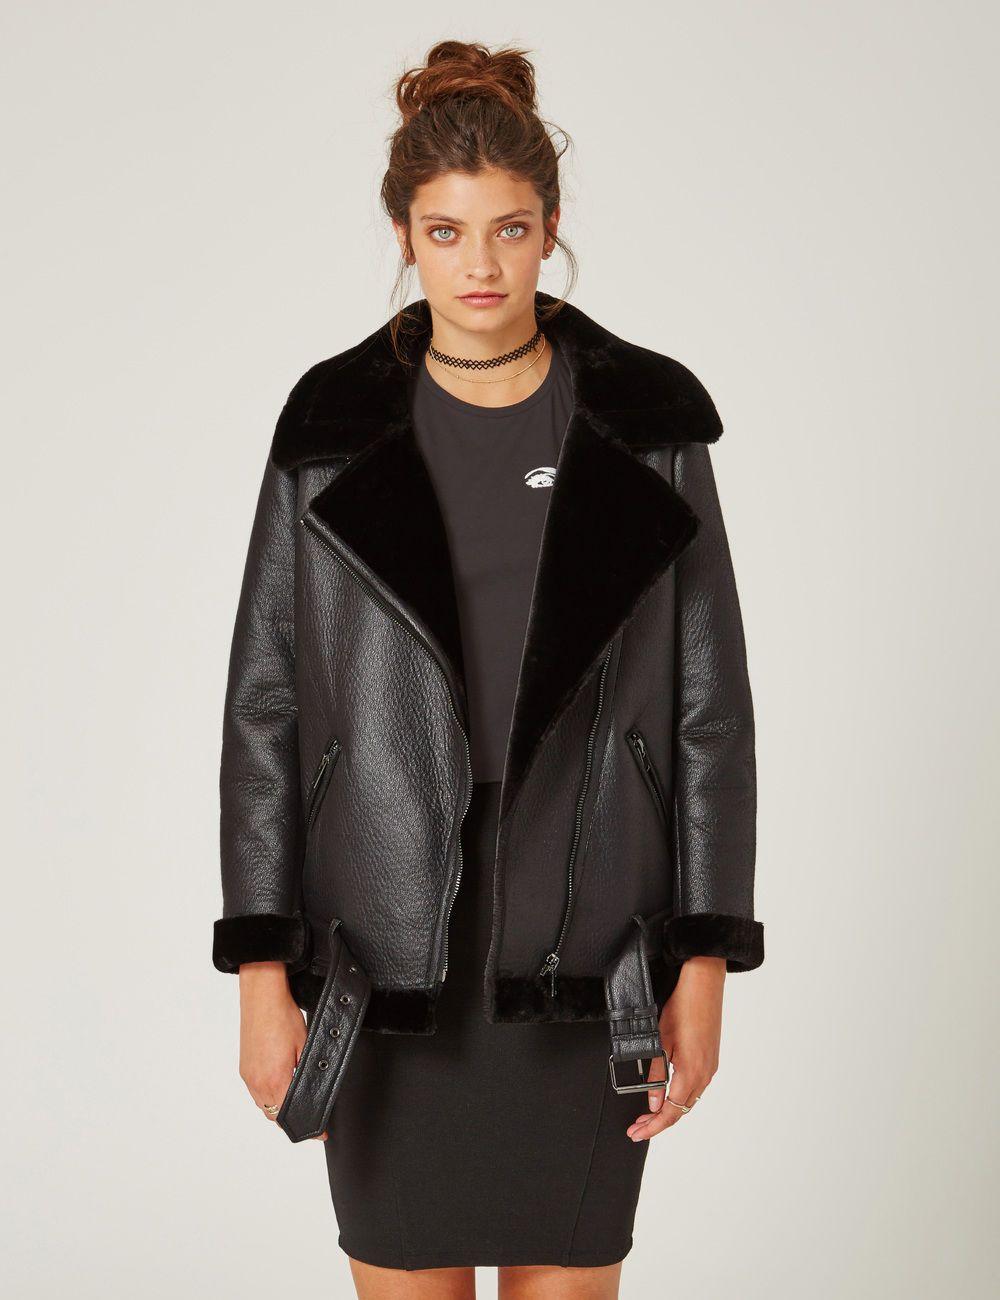 meilleur site web e6b0a da67b Blouson bombardier noir femme • Jennyfer | Shopping ...